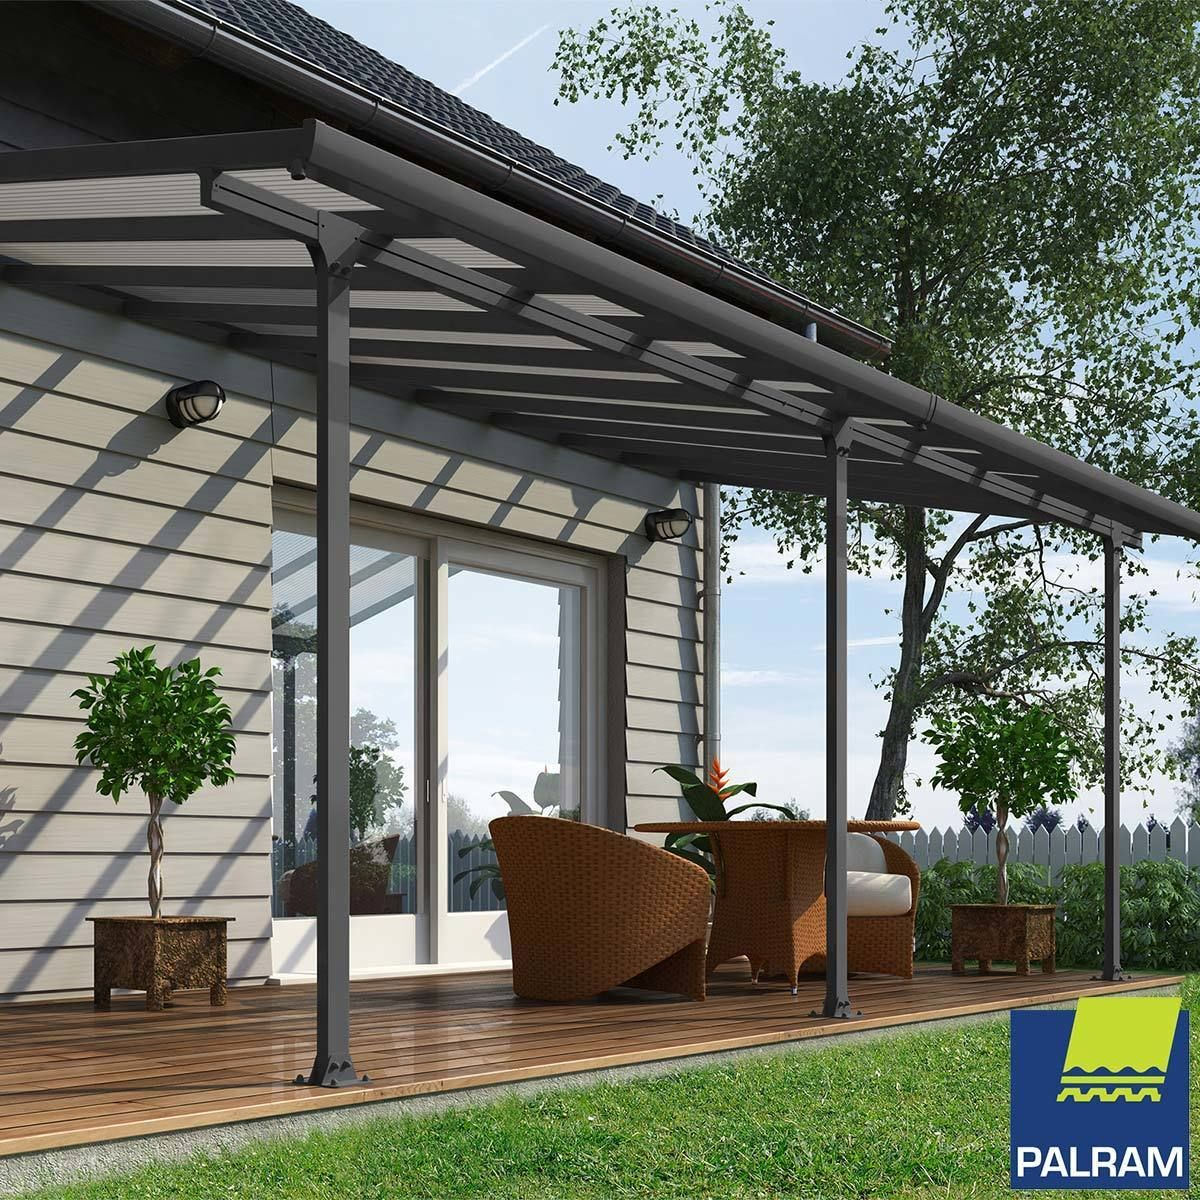 Palram Feria 3 Veranda Patio Cover in Grey, 3 x 6.10m ... on Patio Cover Ideas Uk id=13825